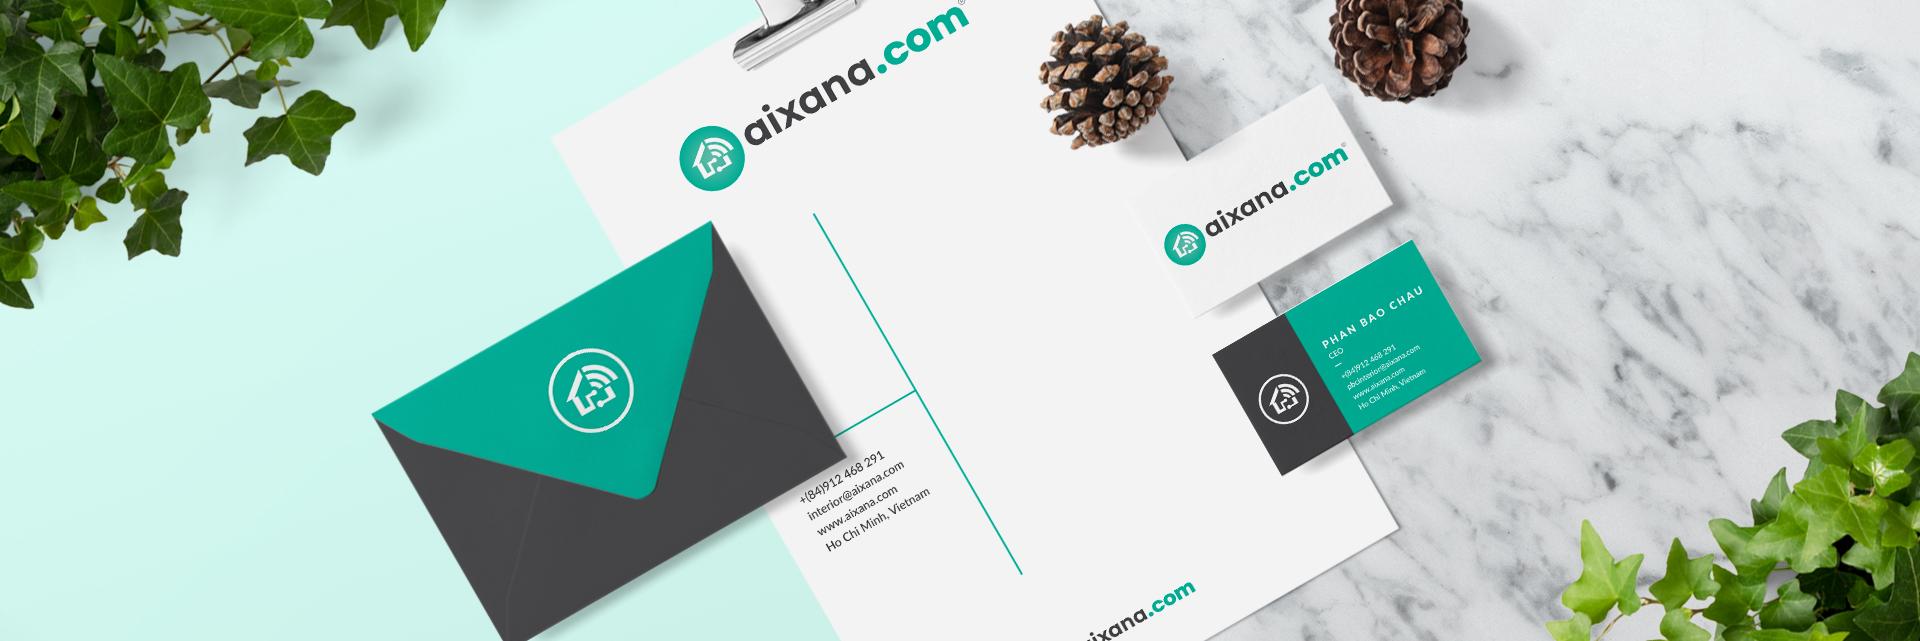 thiet-ke-in-an-logo-re-dep-aixana-slide2